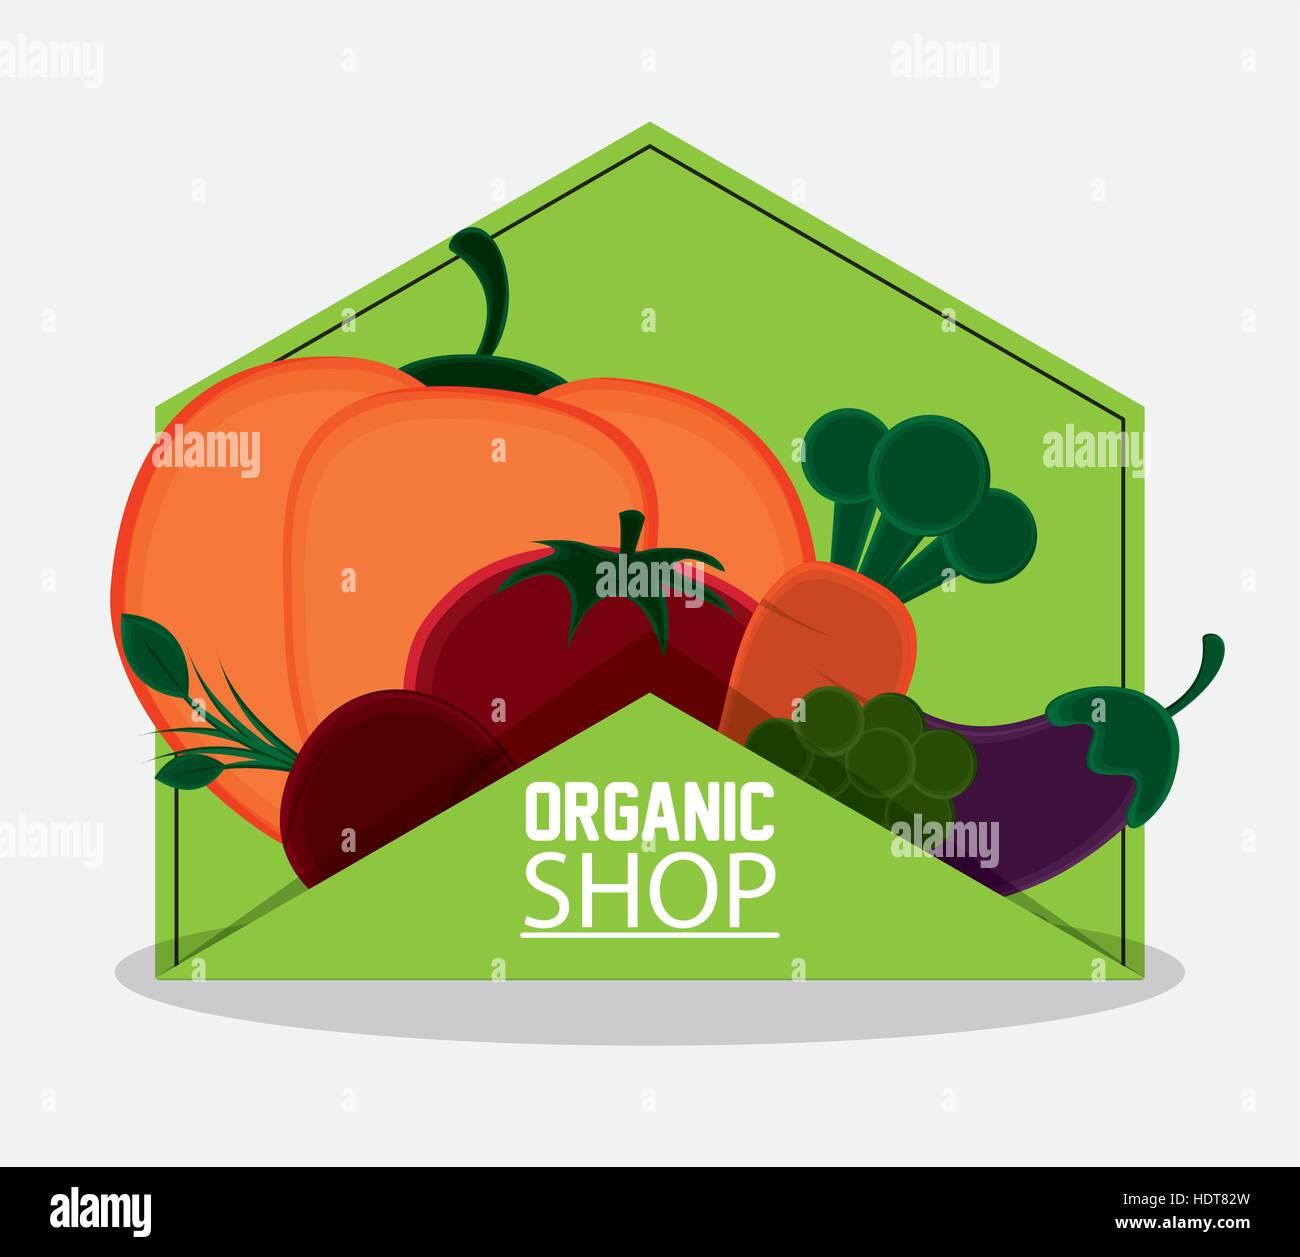 Organic Vegetables Shop Sign Stock Photos & Organic ...